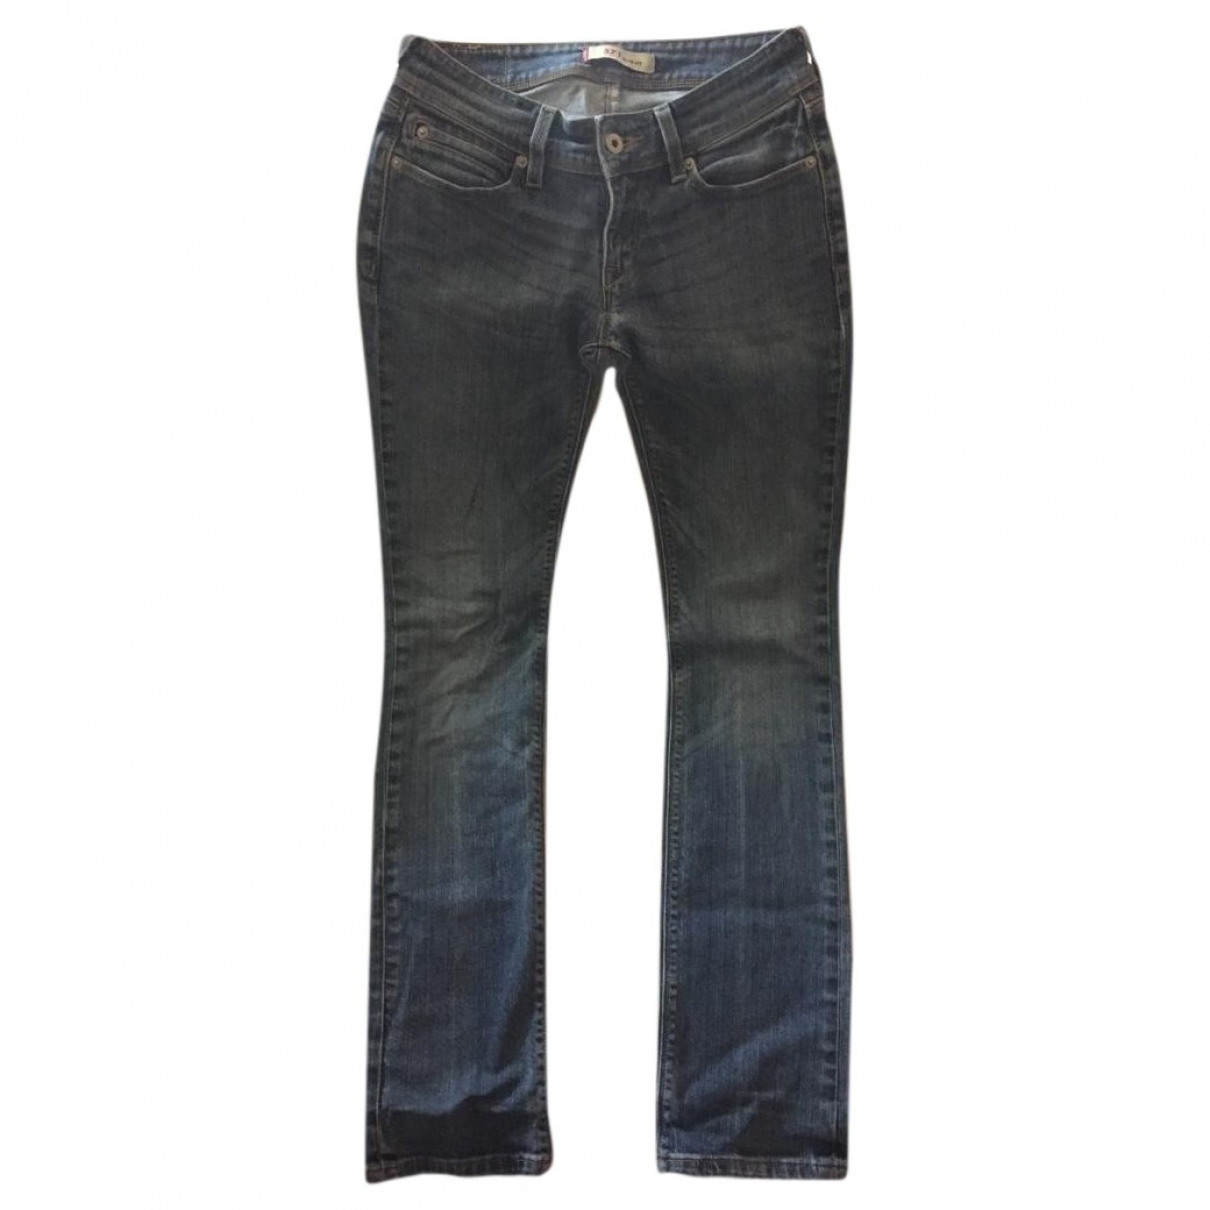 Levi's \N Denim - Jeans Jeans for Women 42 FR